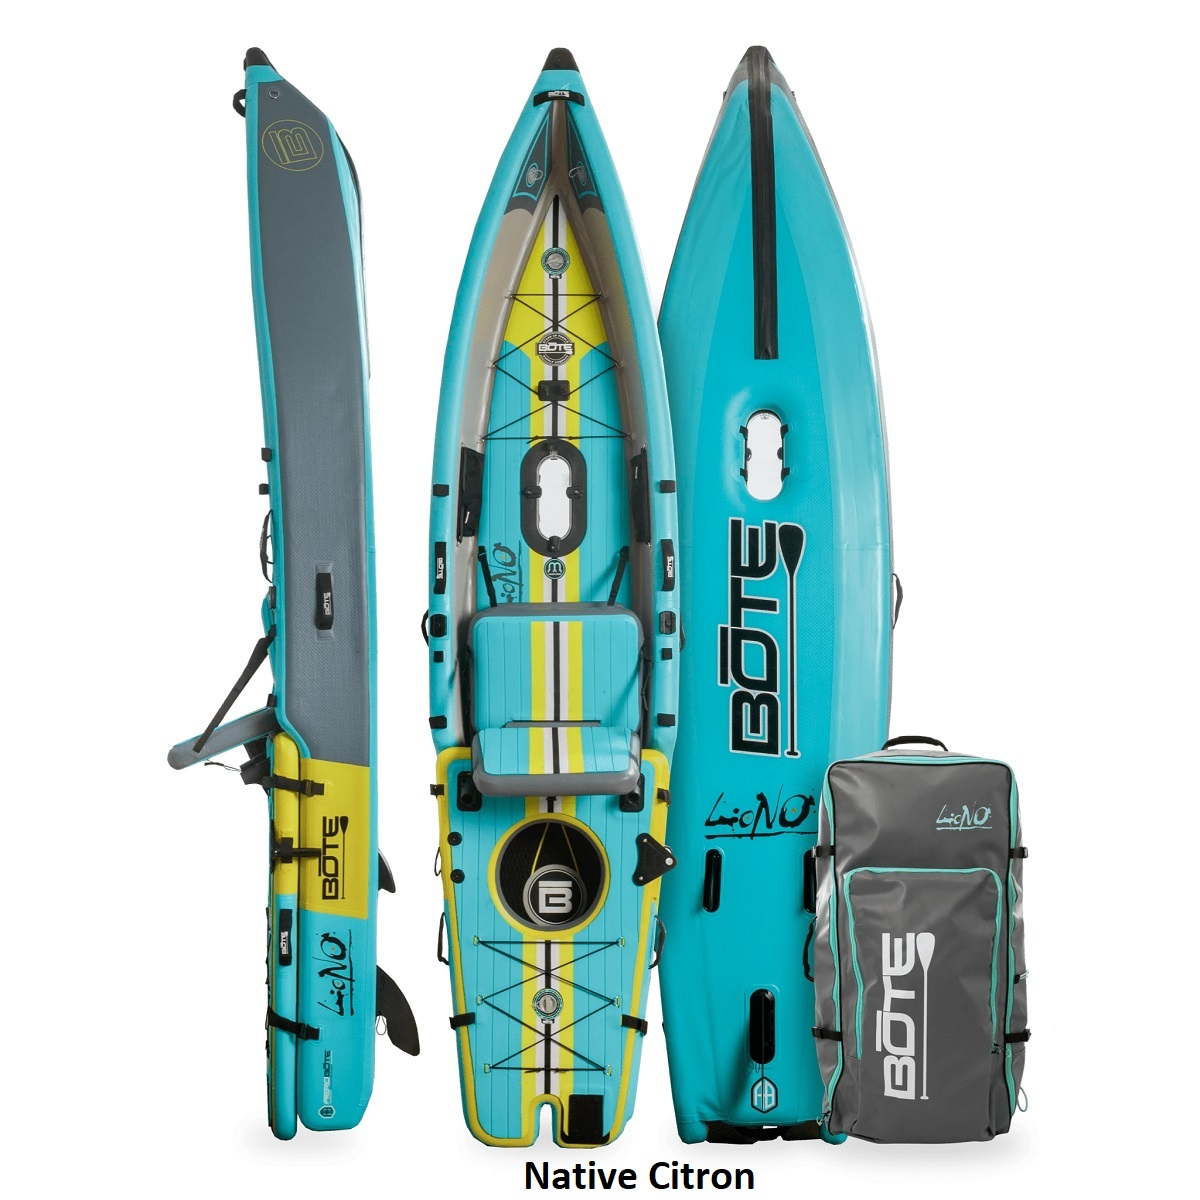 BOTE Lono Inflatable Kayak - Native Citron 1